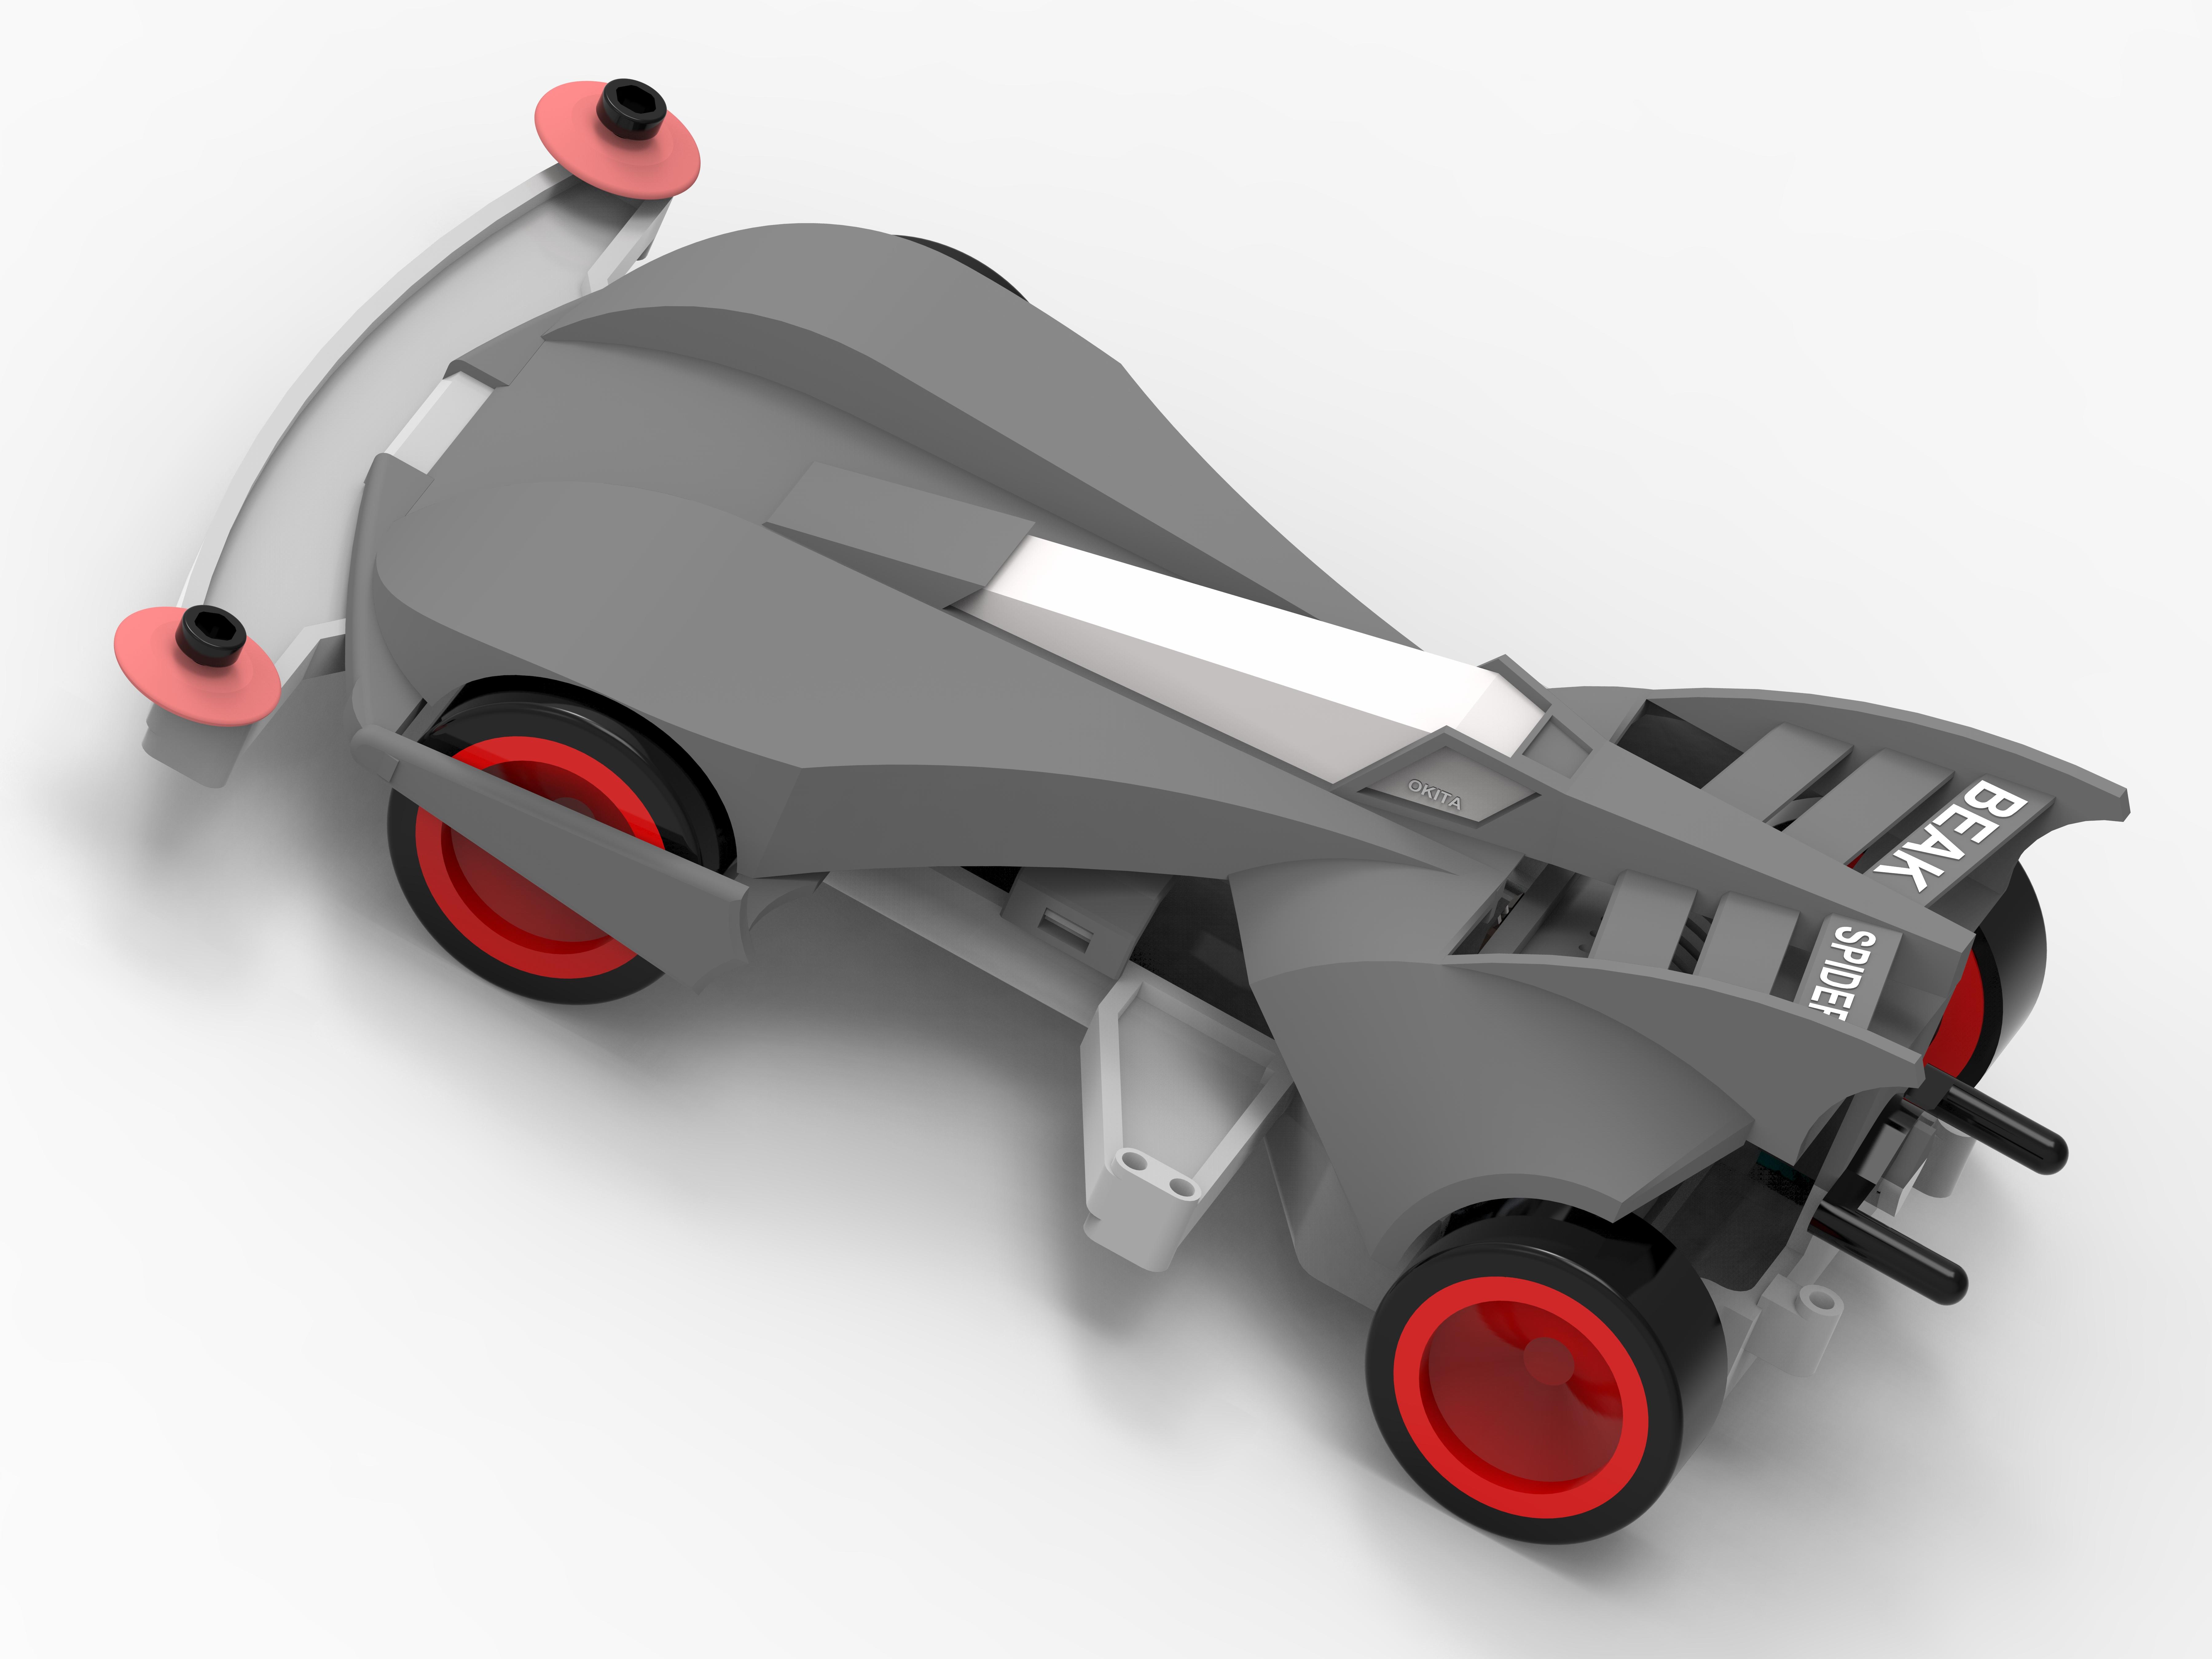 Beak Spider Tamiya Car蜘蛛王四驱车3D图纸 SOLIDEDGE设计 附STP